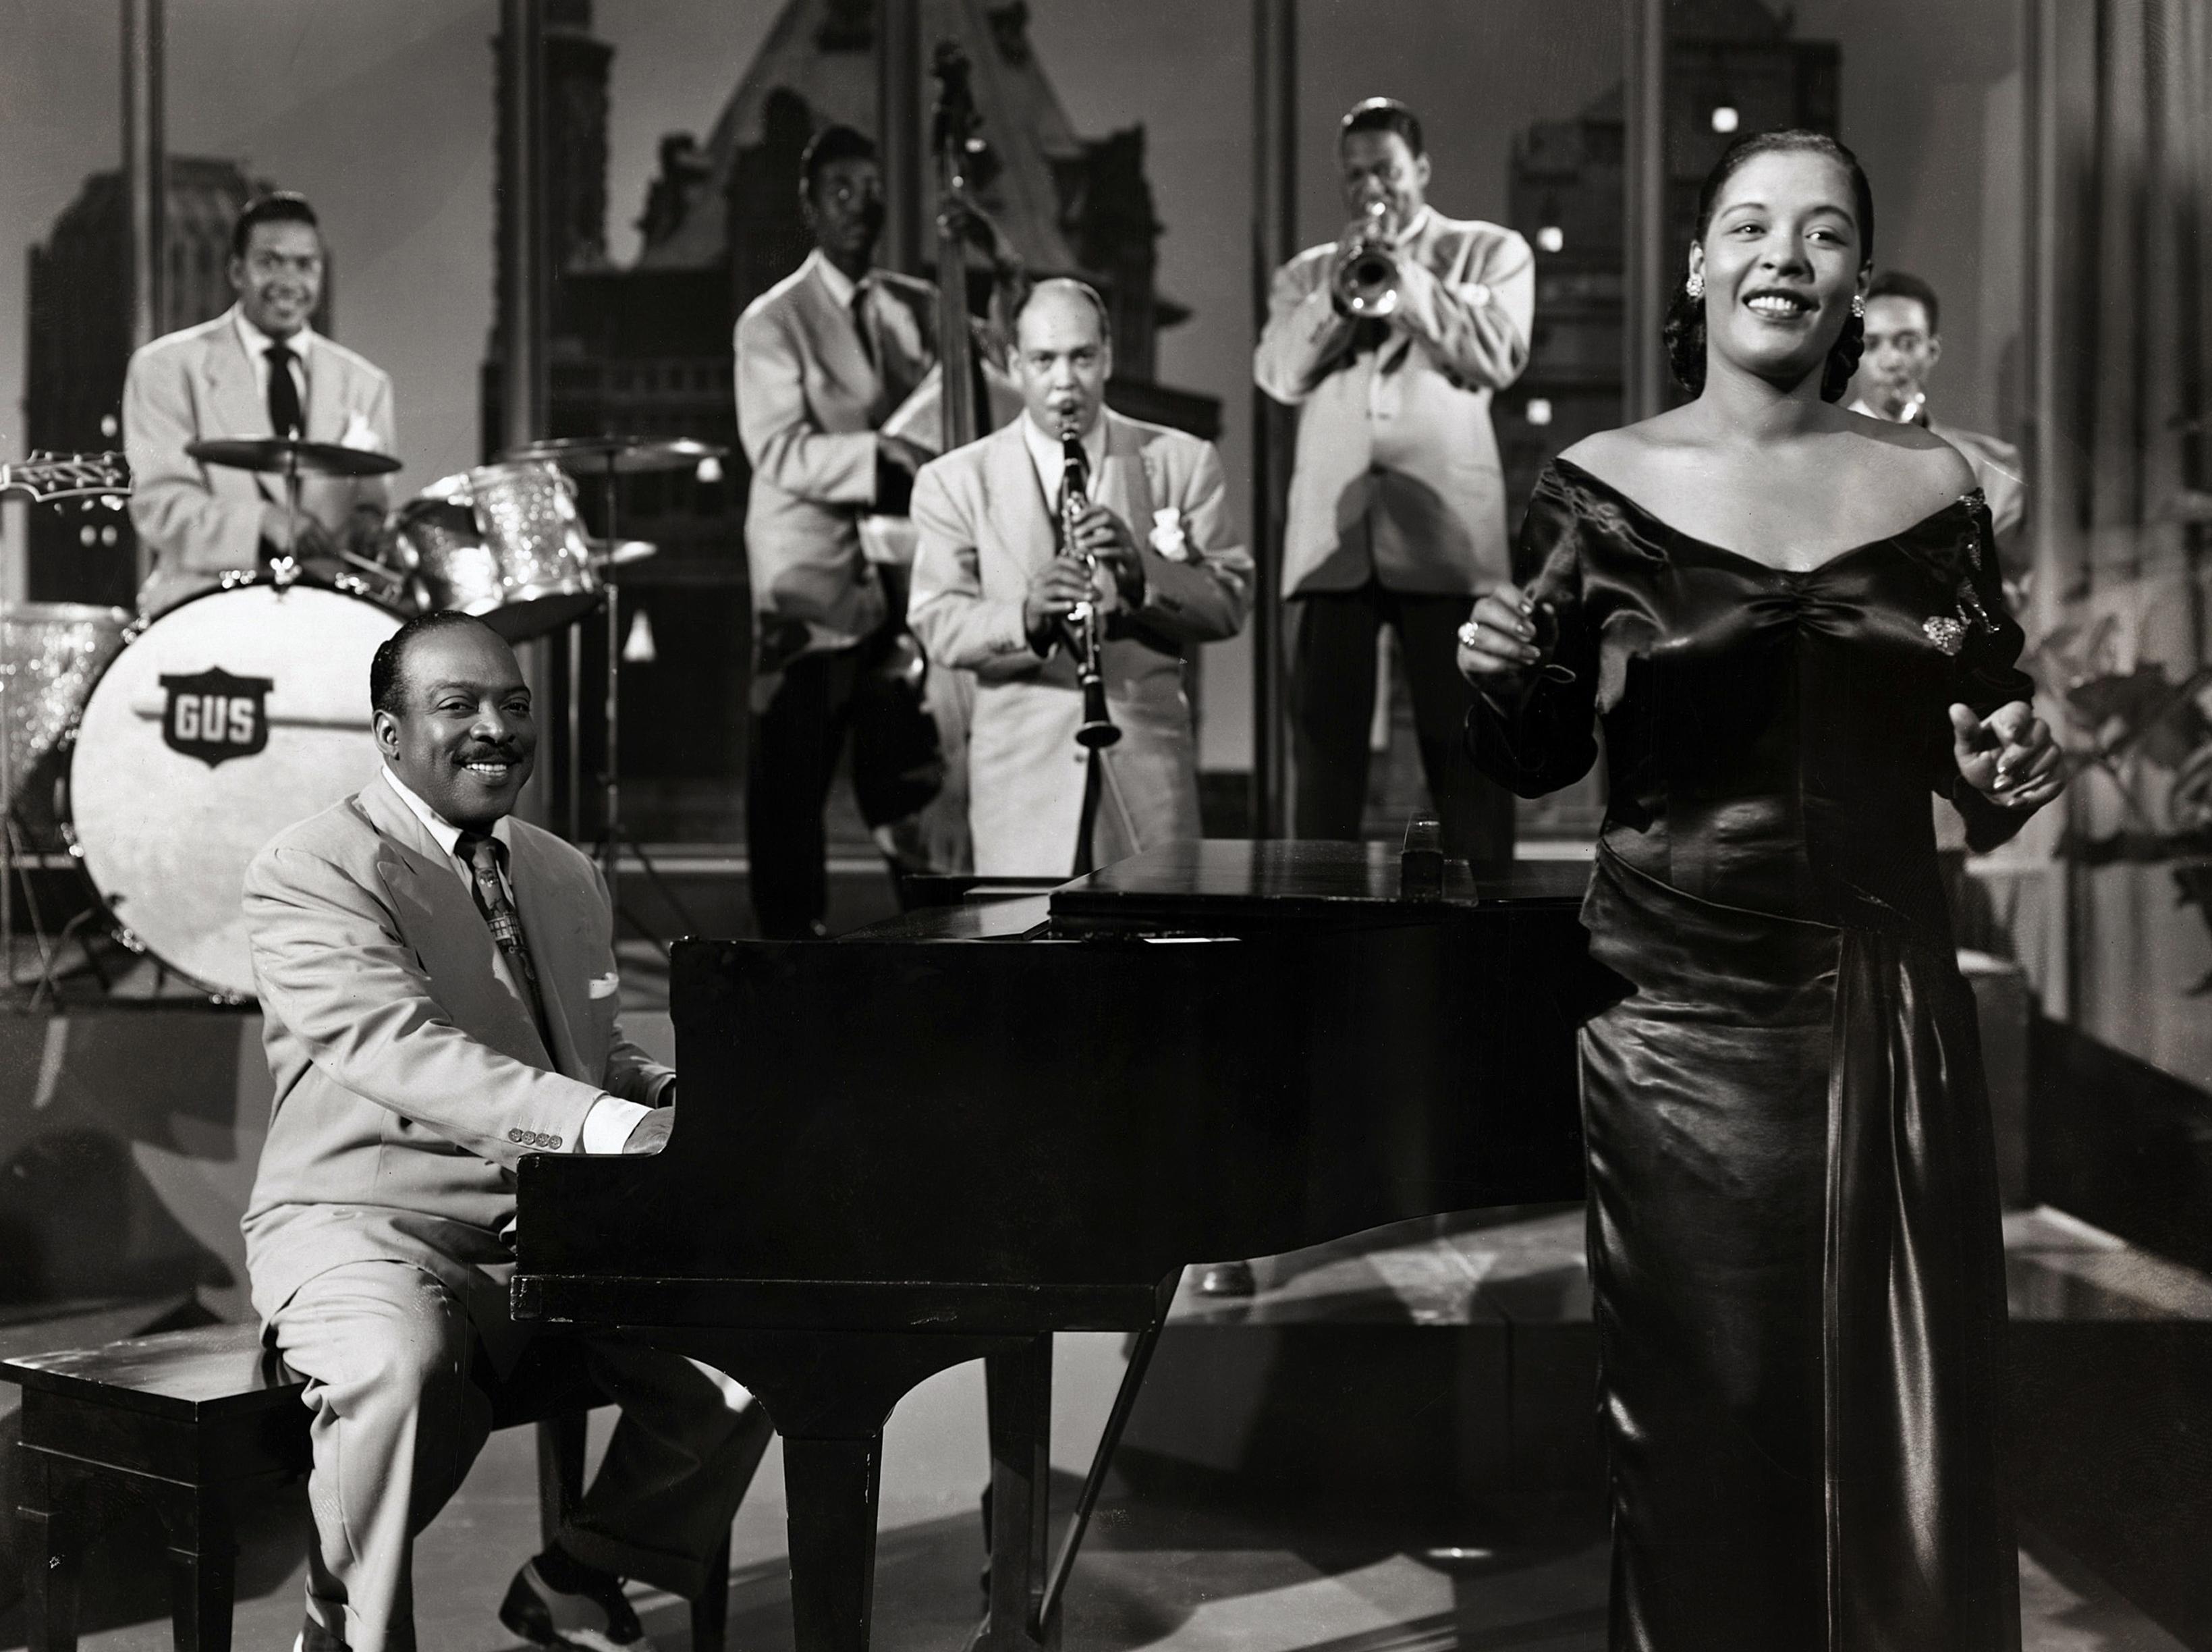 American jazz musician Count Basie, Billie Holiday